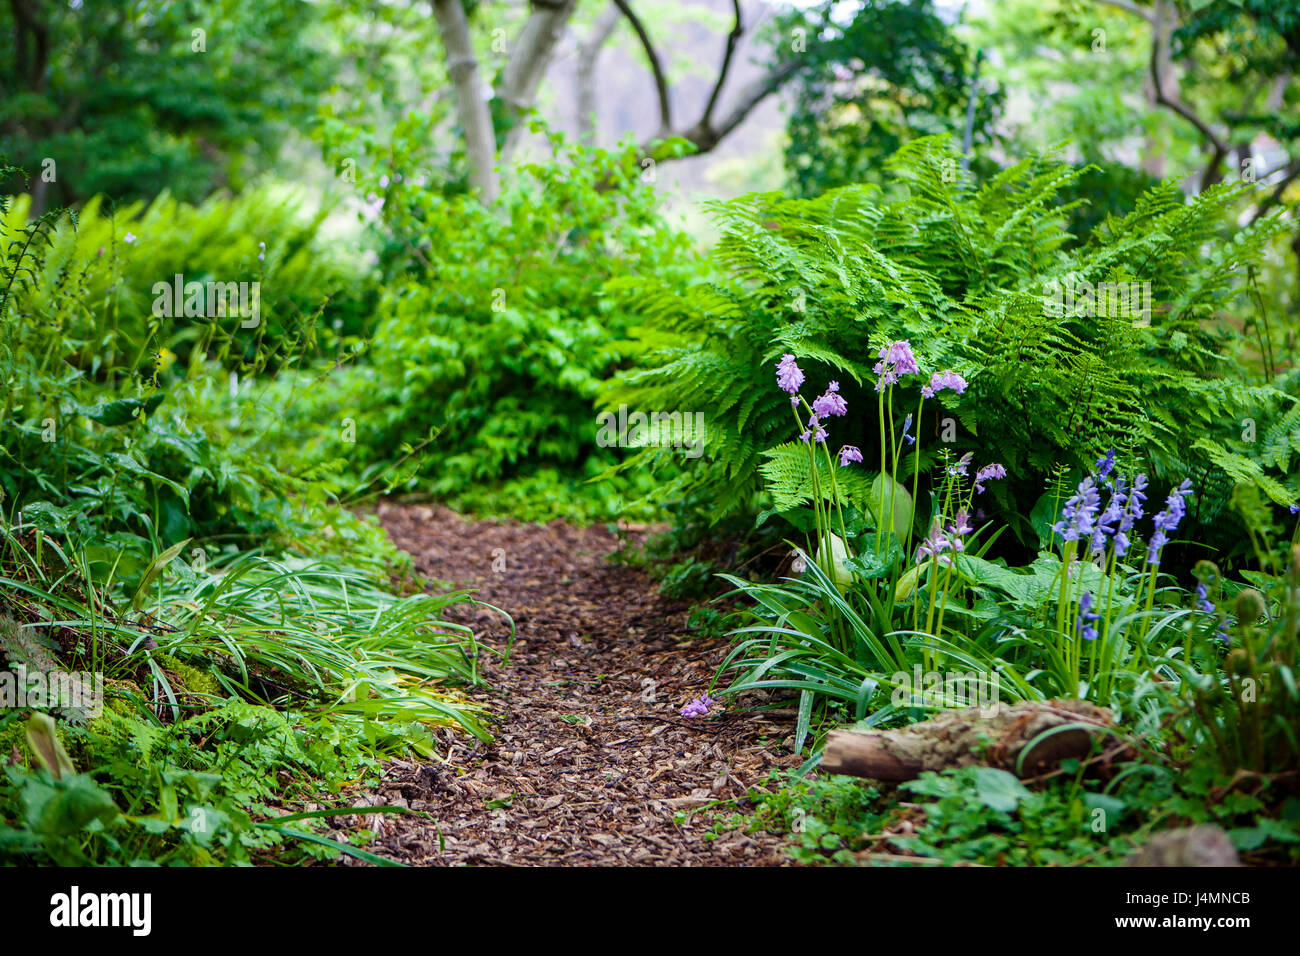 Hortus Botanicus, Botanical garden in Leiden, Netherlands - Stock Image